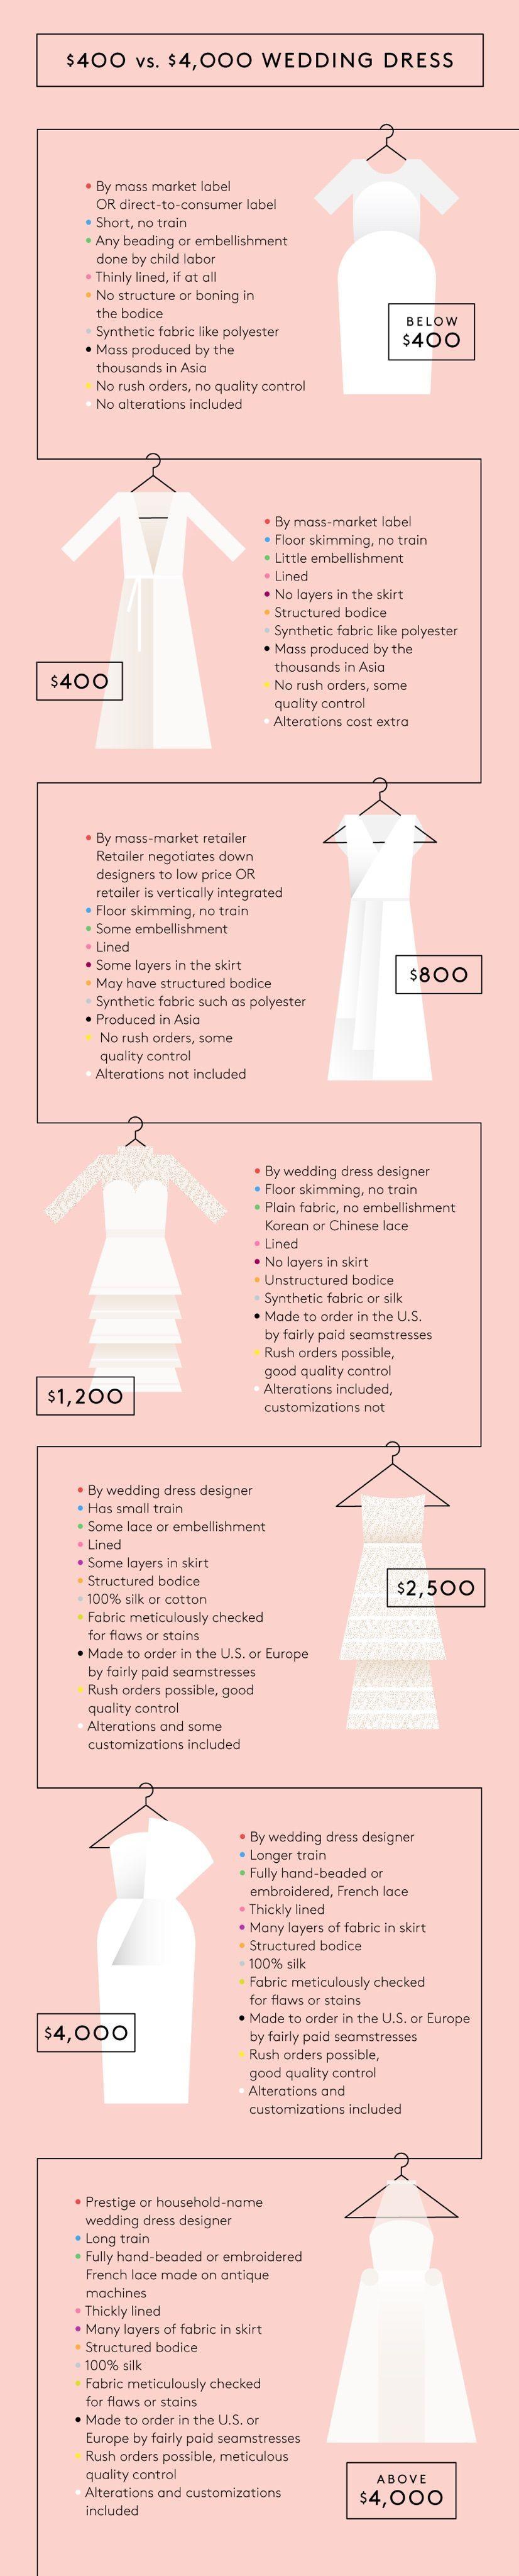 The Difference Between A $400 & $4,000 Wedding Dress | Wedding dress ...